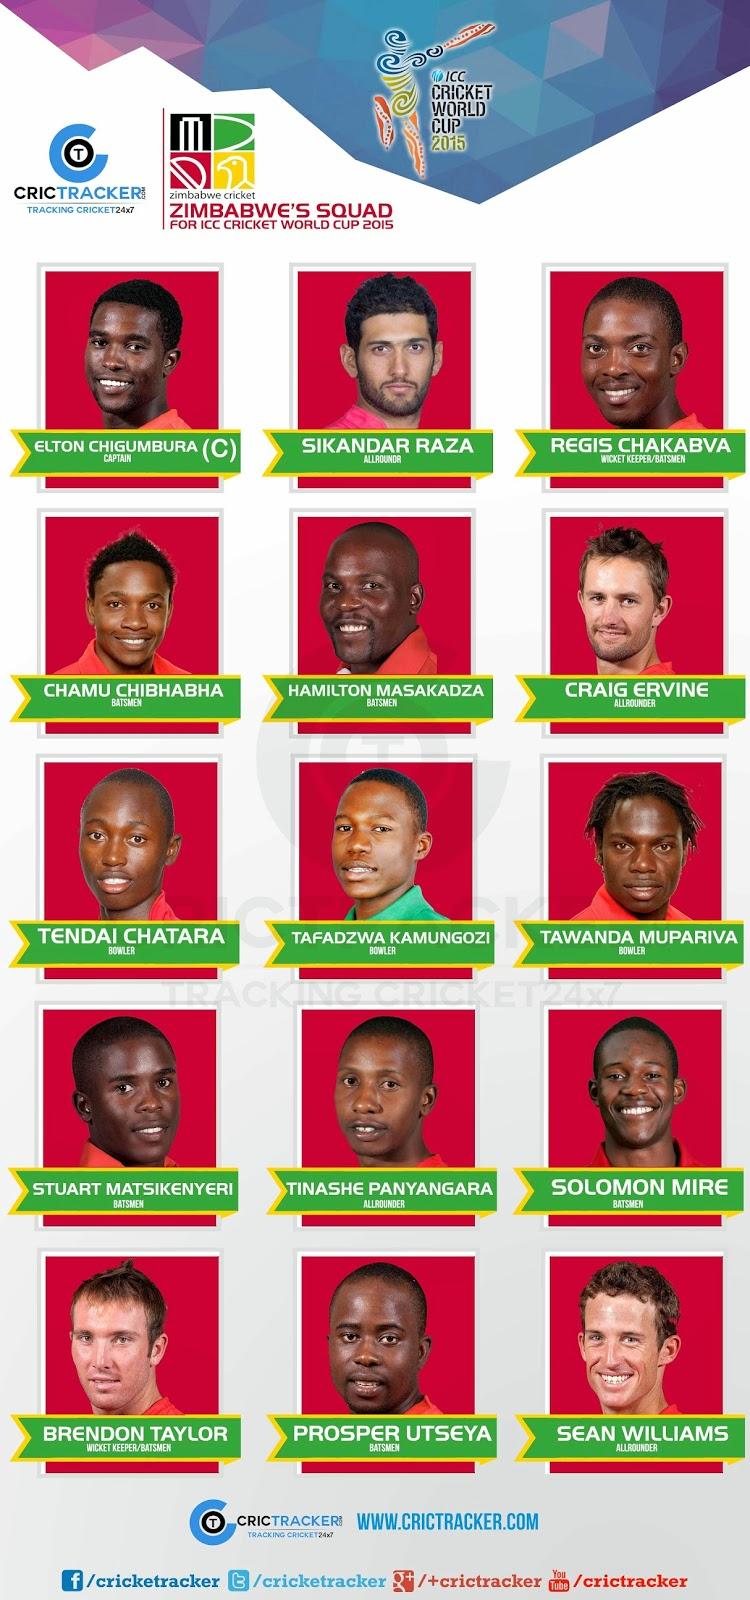 Cricket world cup 2015...